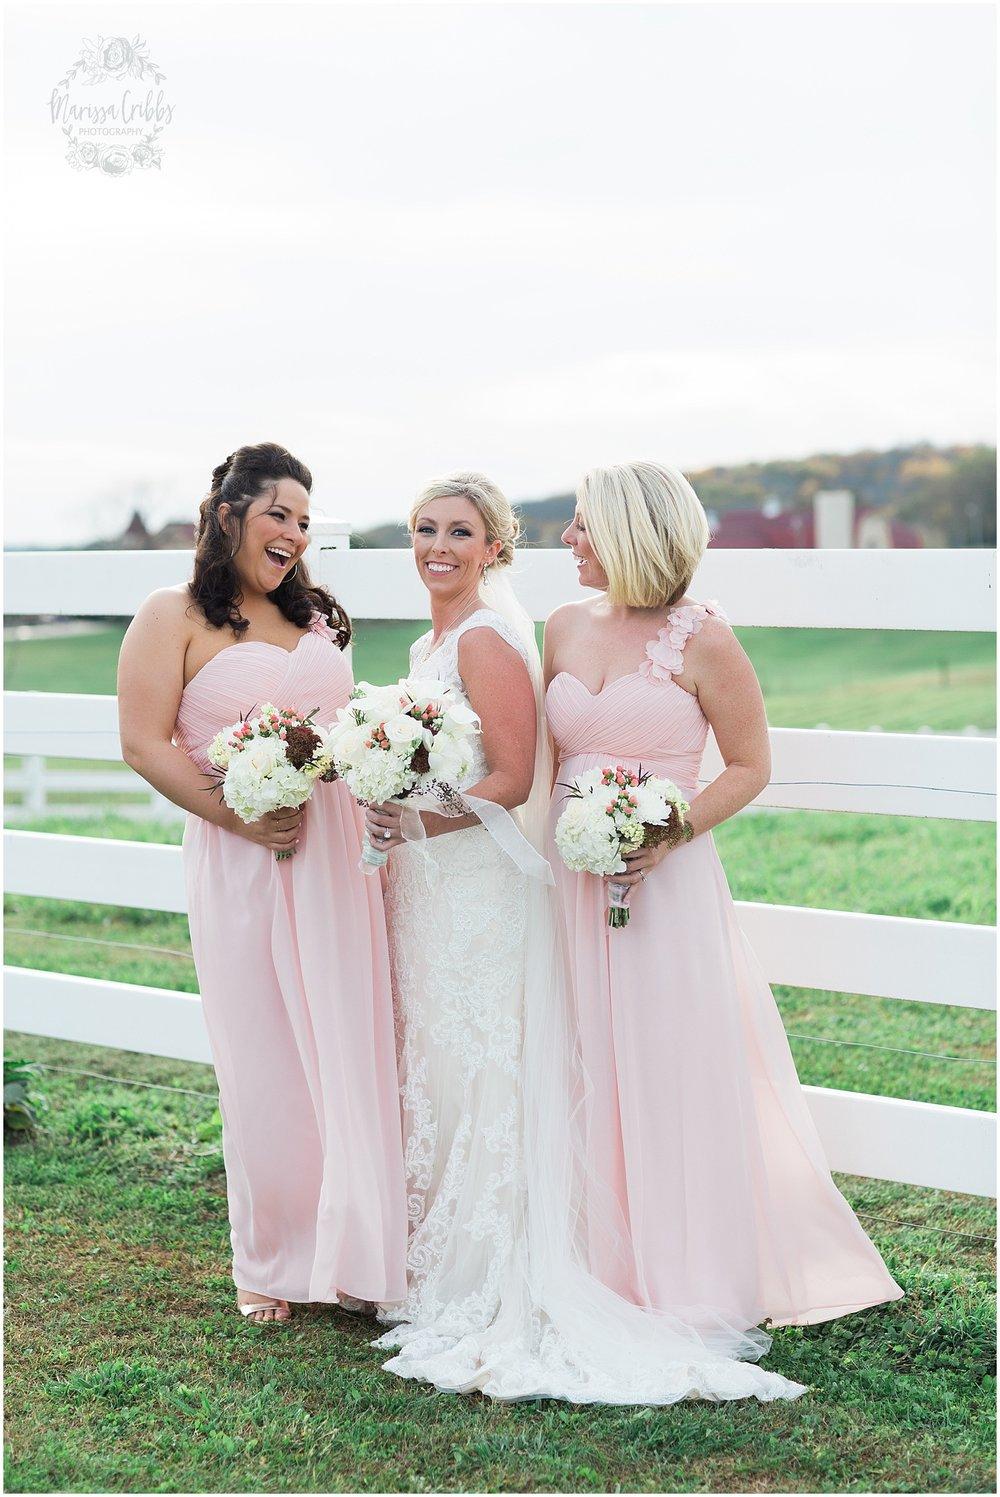 Alex & Amie | Eighteen Ninety Event Space | Marissa Cribbs Photography | Kansas City Perfect Wedding Guide_1310.jpg